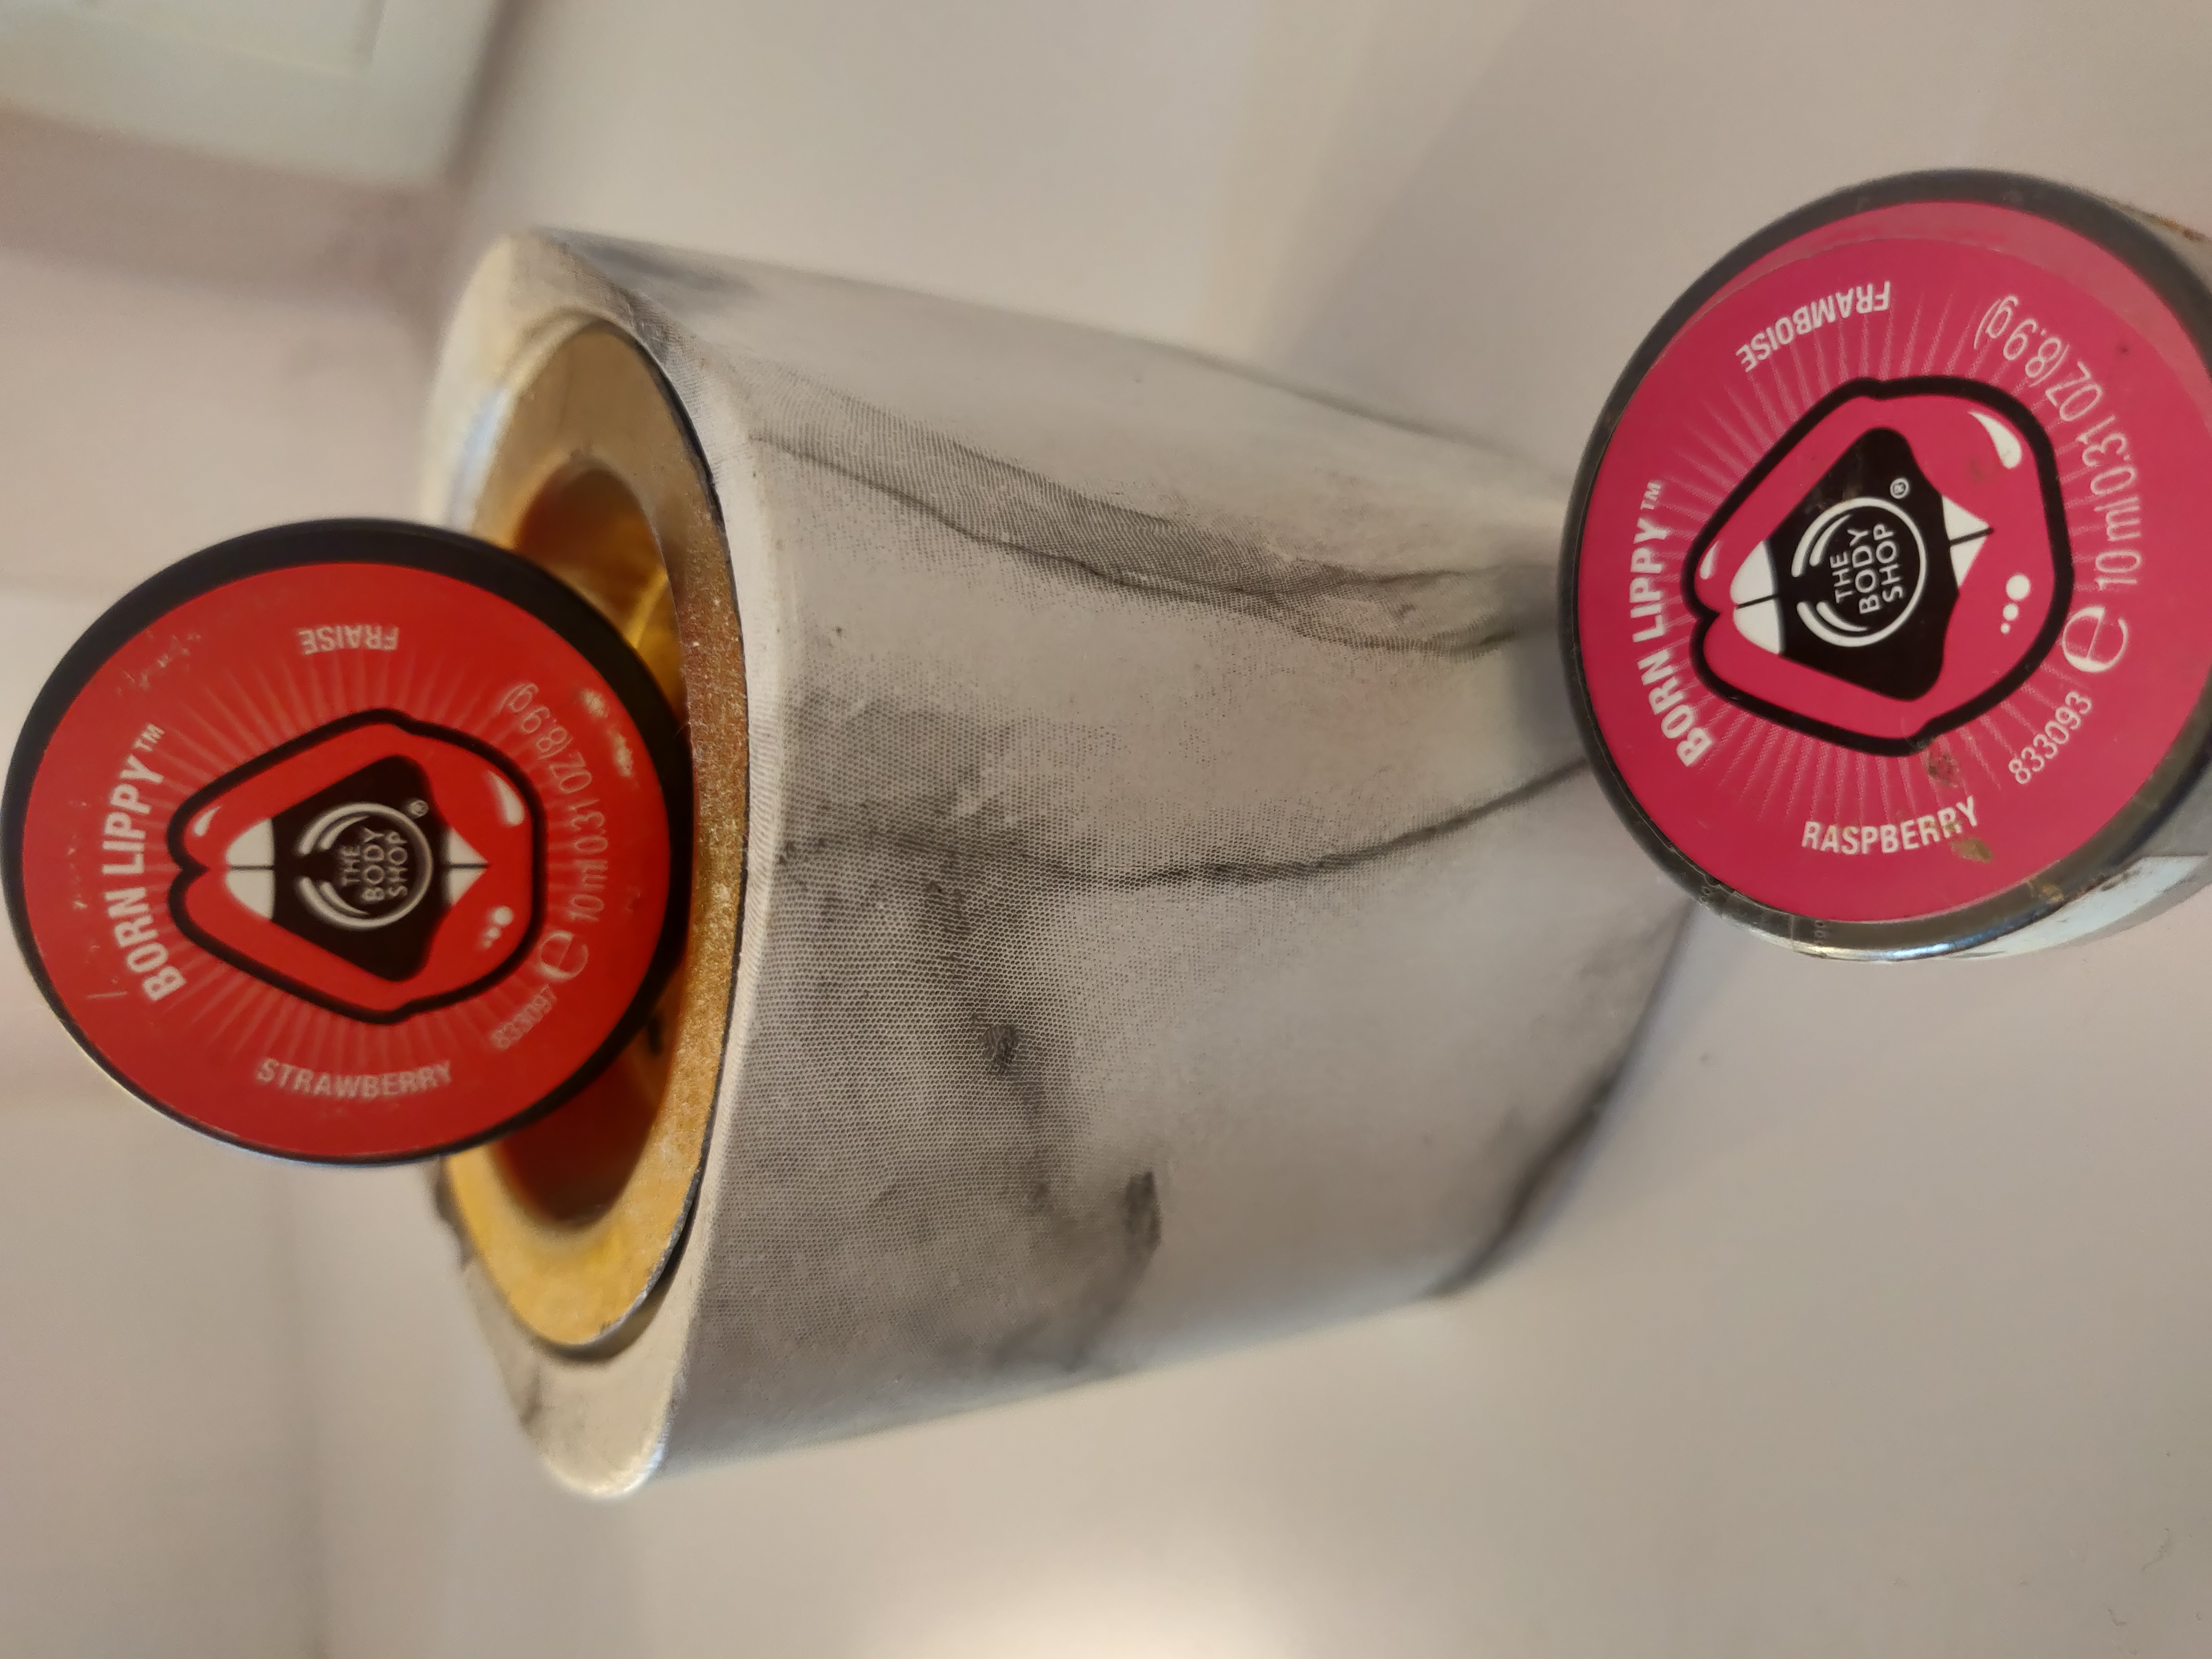 The Body Shop Born Lippy Pot Lip Balm Strawberry-Cult lip moisture in a pot-By apekshap